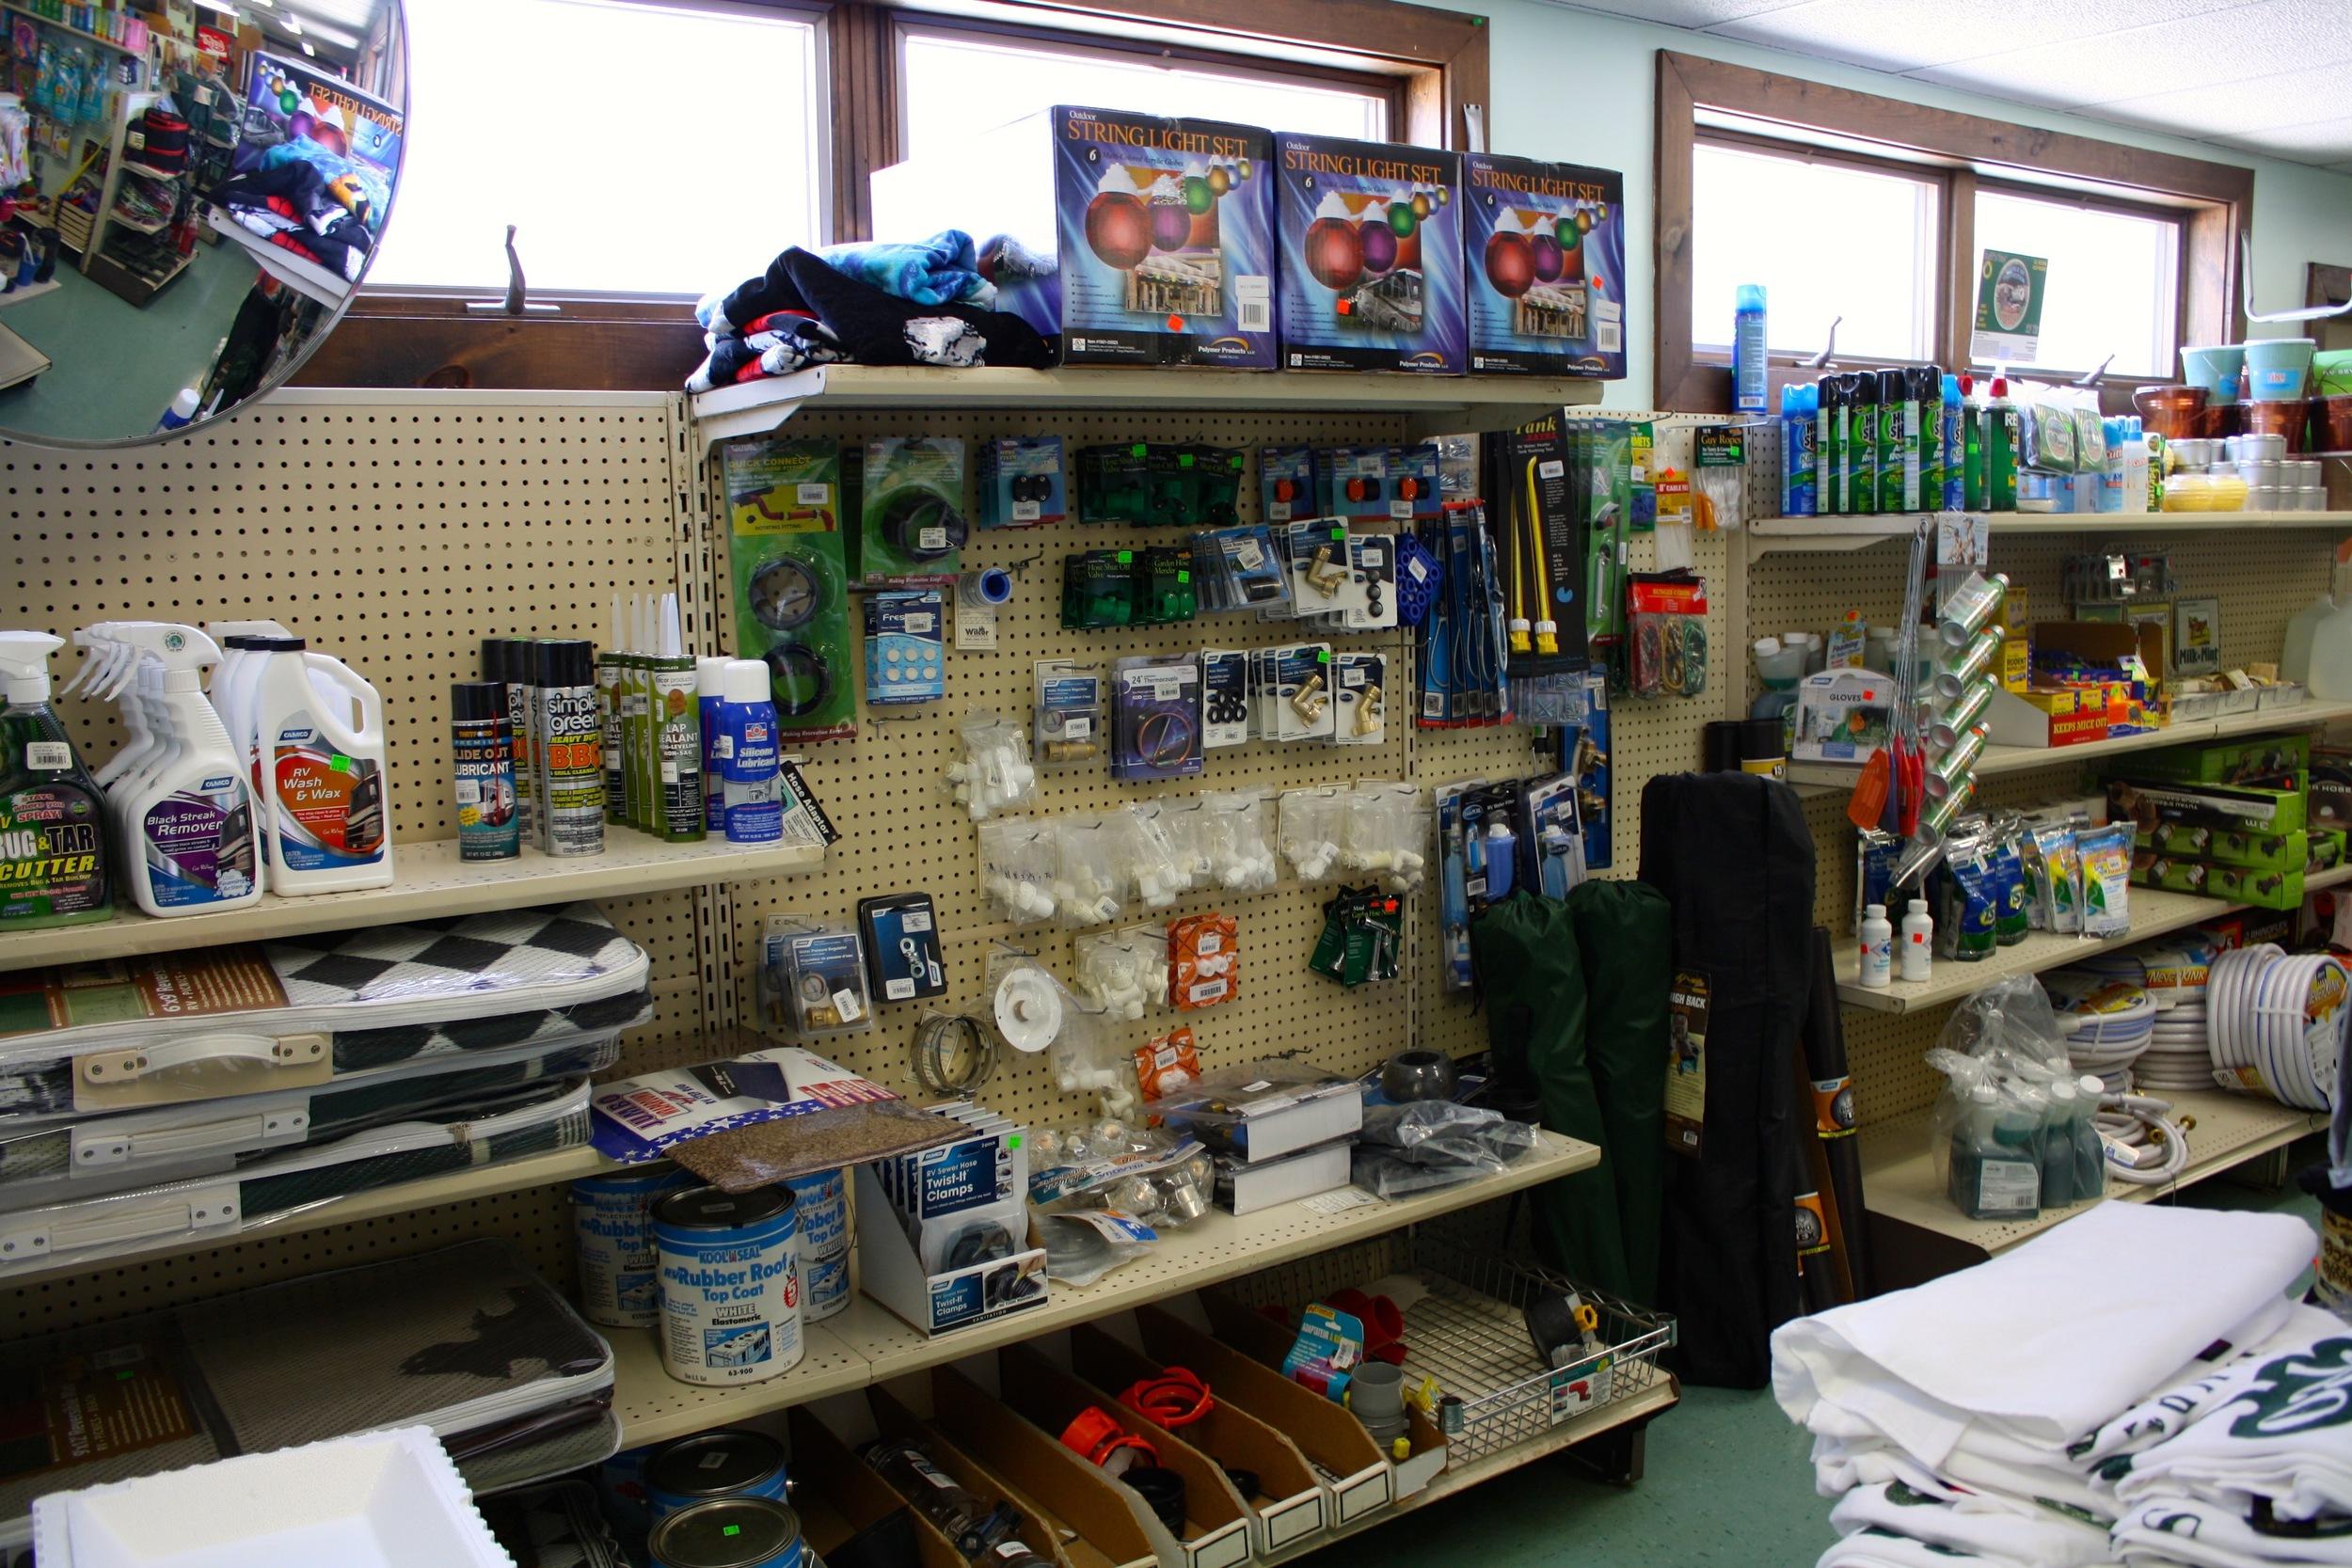 rv parts and camping supplies